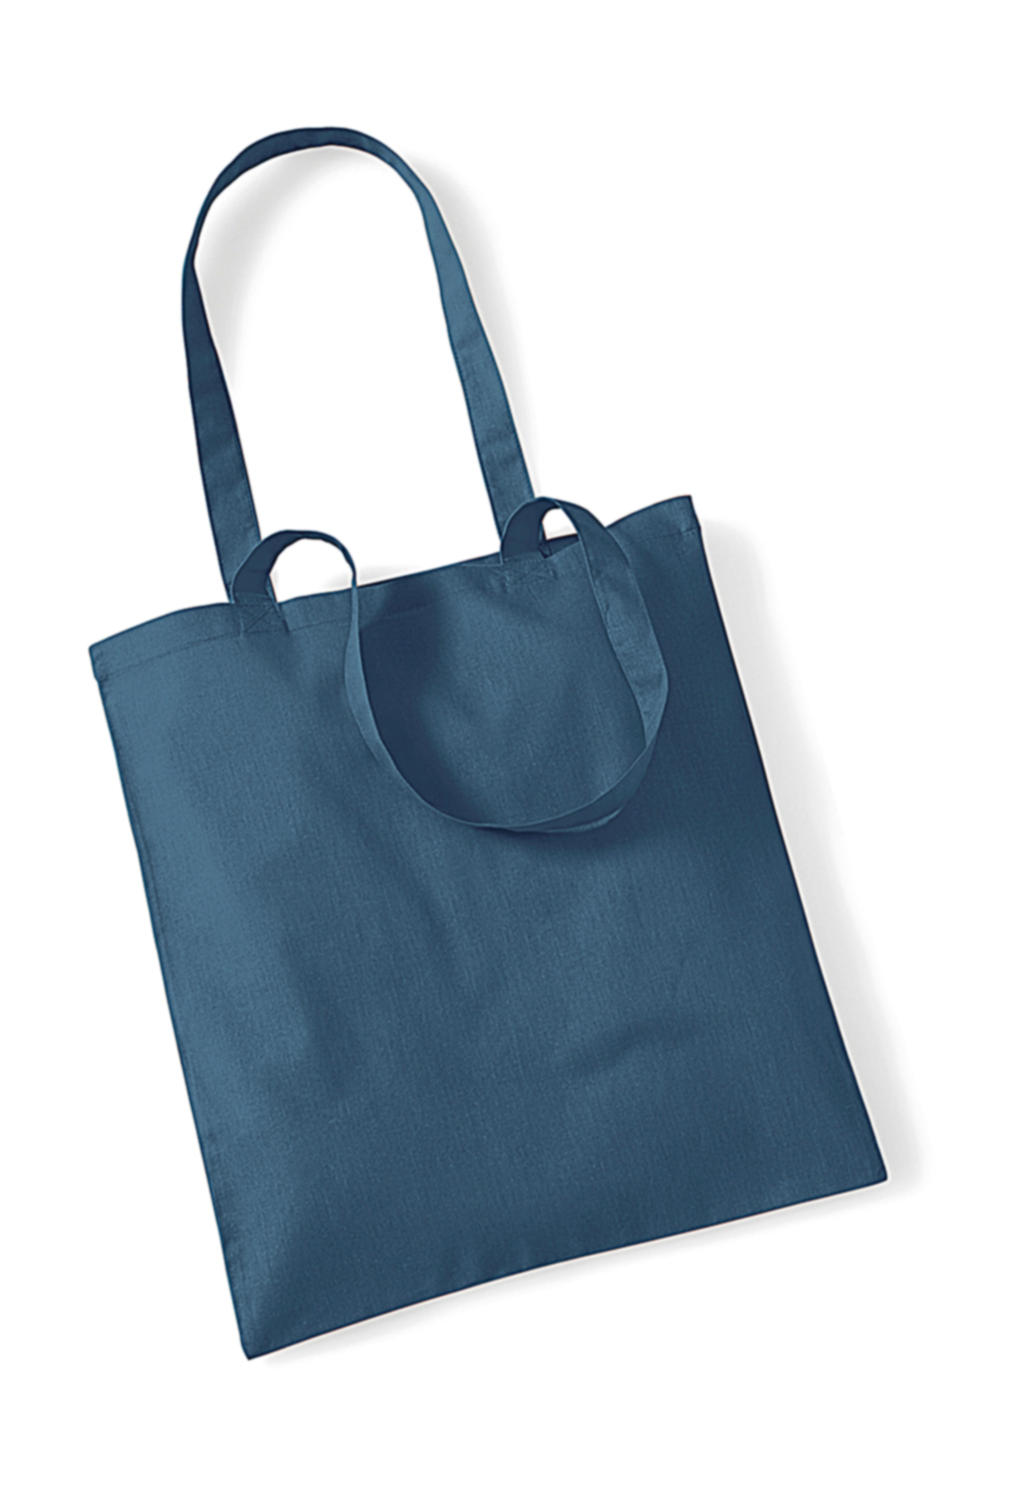 Bag for Life - Long Handles - zvìtšit obrázek